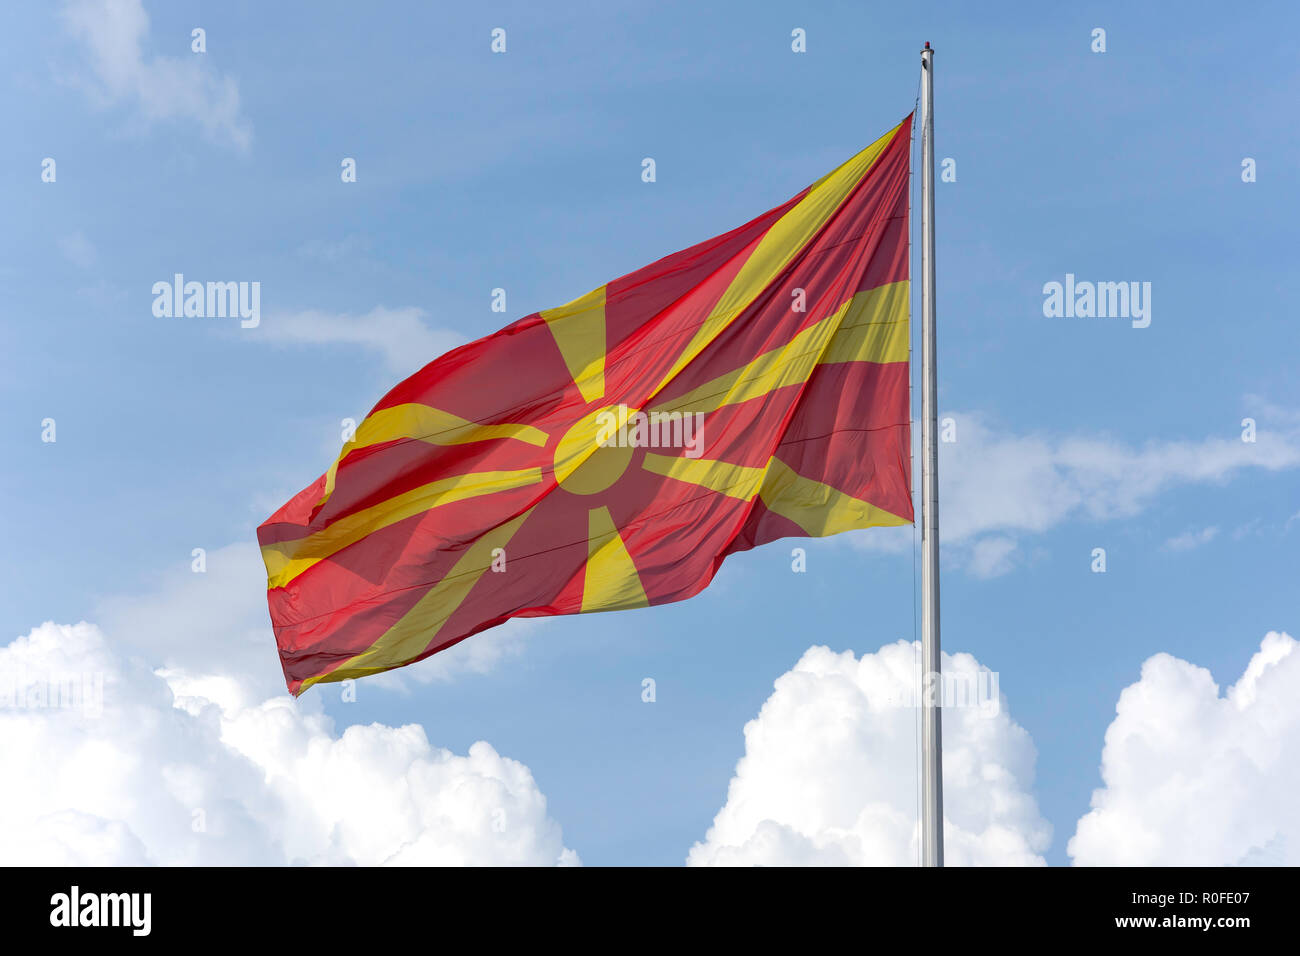 Macedonian flag on flagpole, Skopje, Skopje Region, Republic of Macedonia - Stock Image